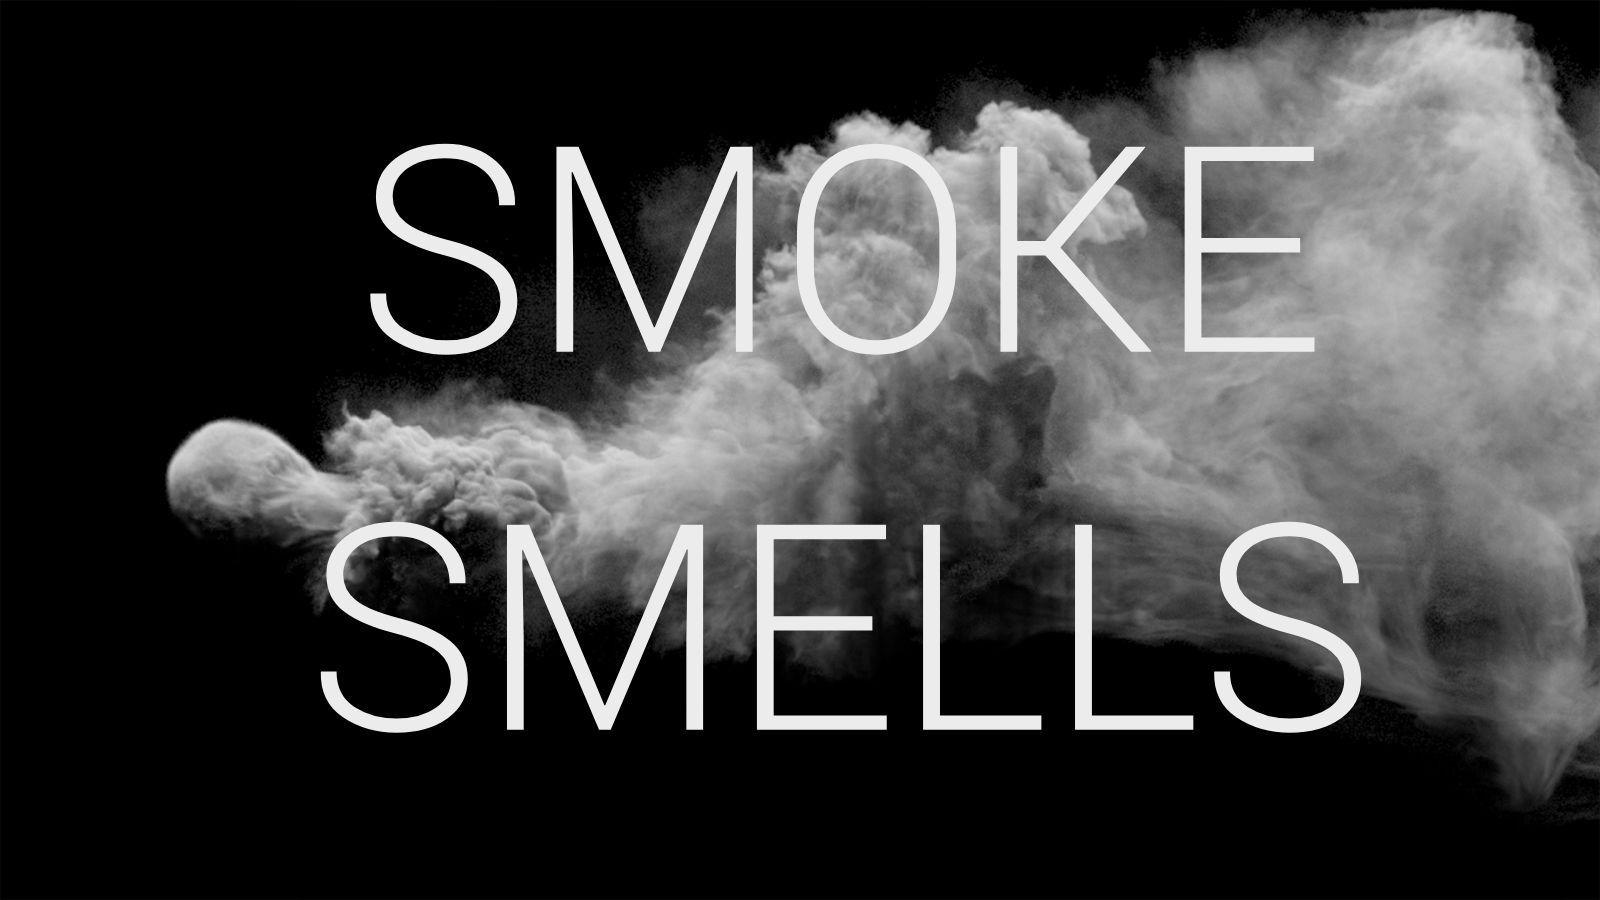 ULTIMATE SMOKE ODOR EXTERMINATOR GET RID OF SMELLS